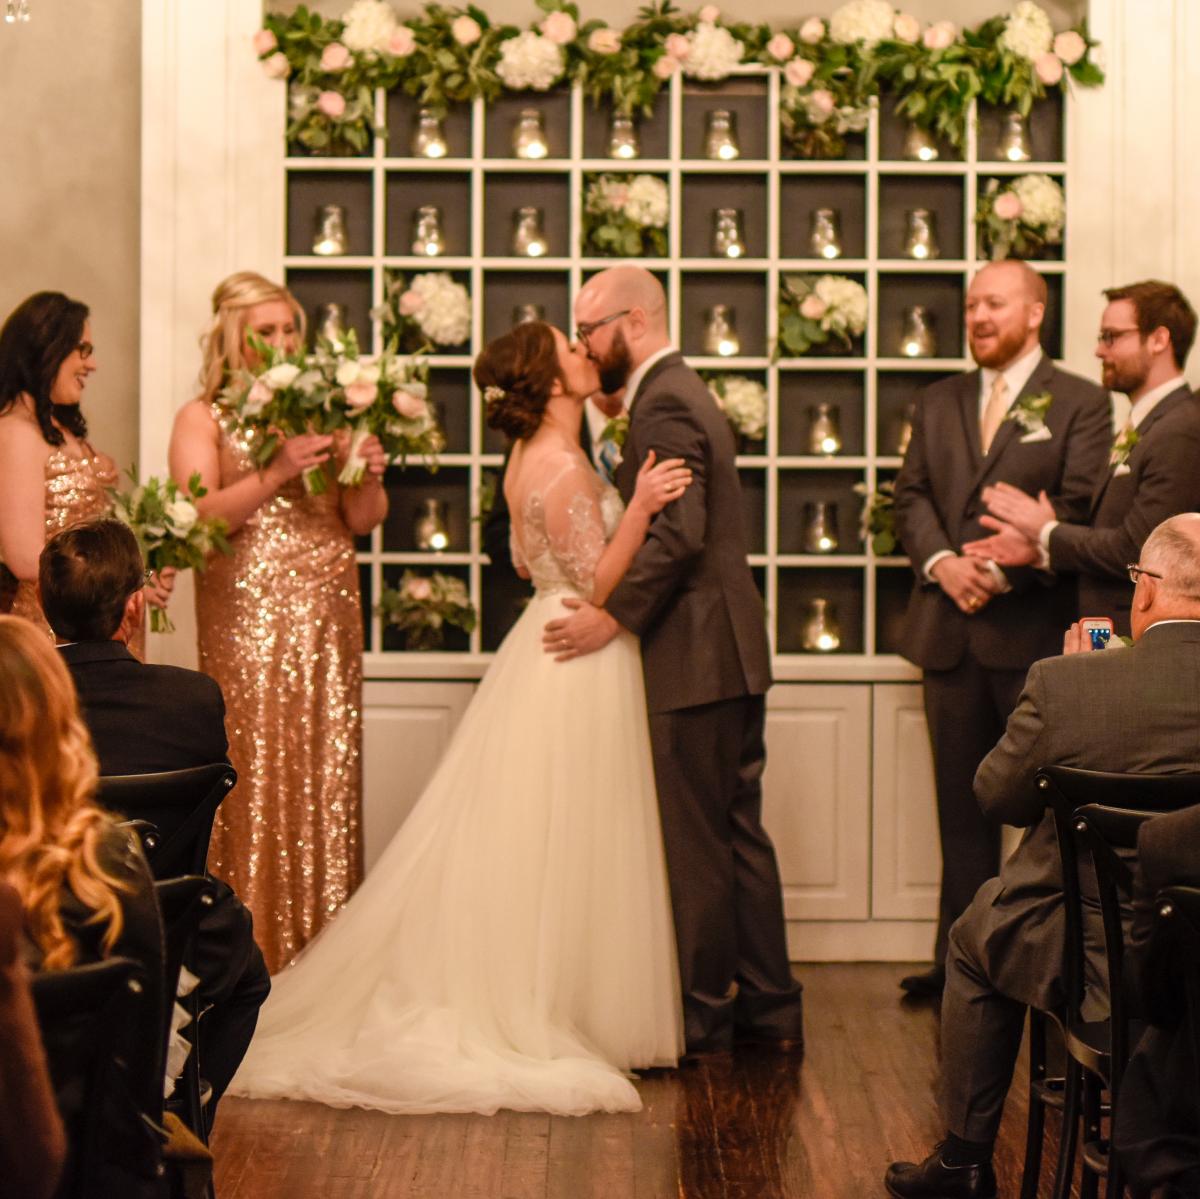 Beville Wedding, Ceremony